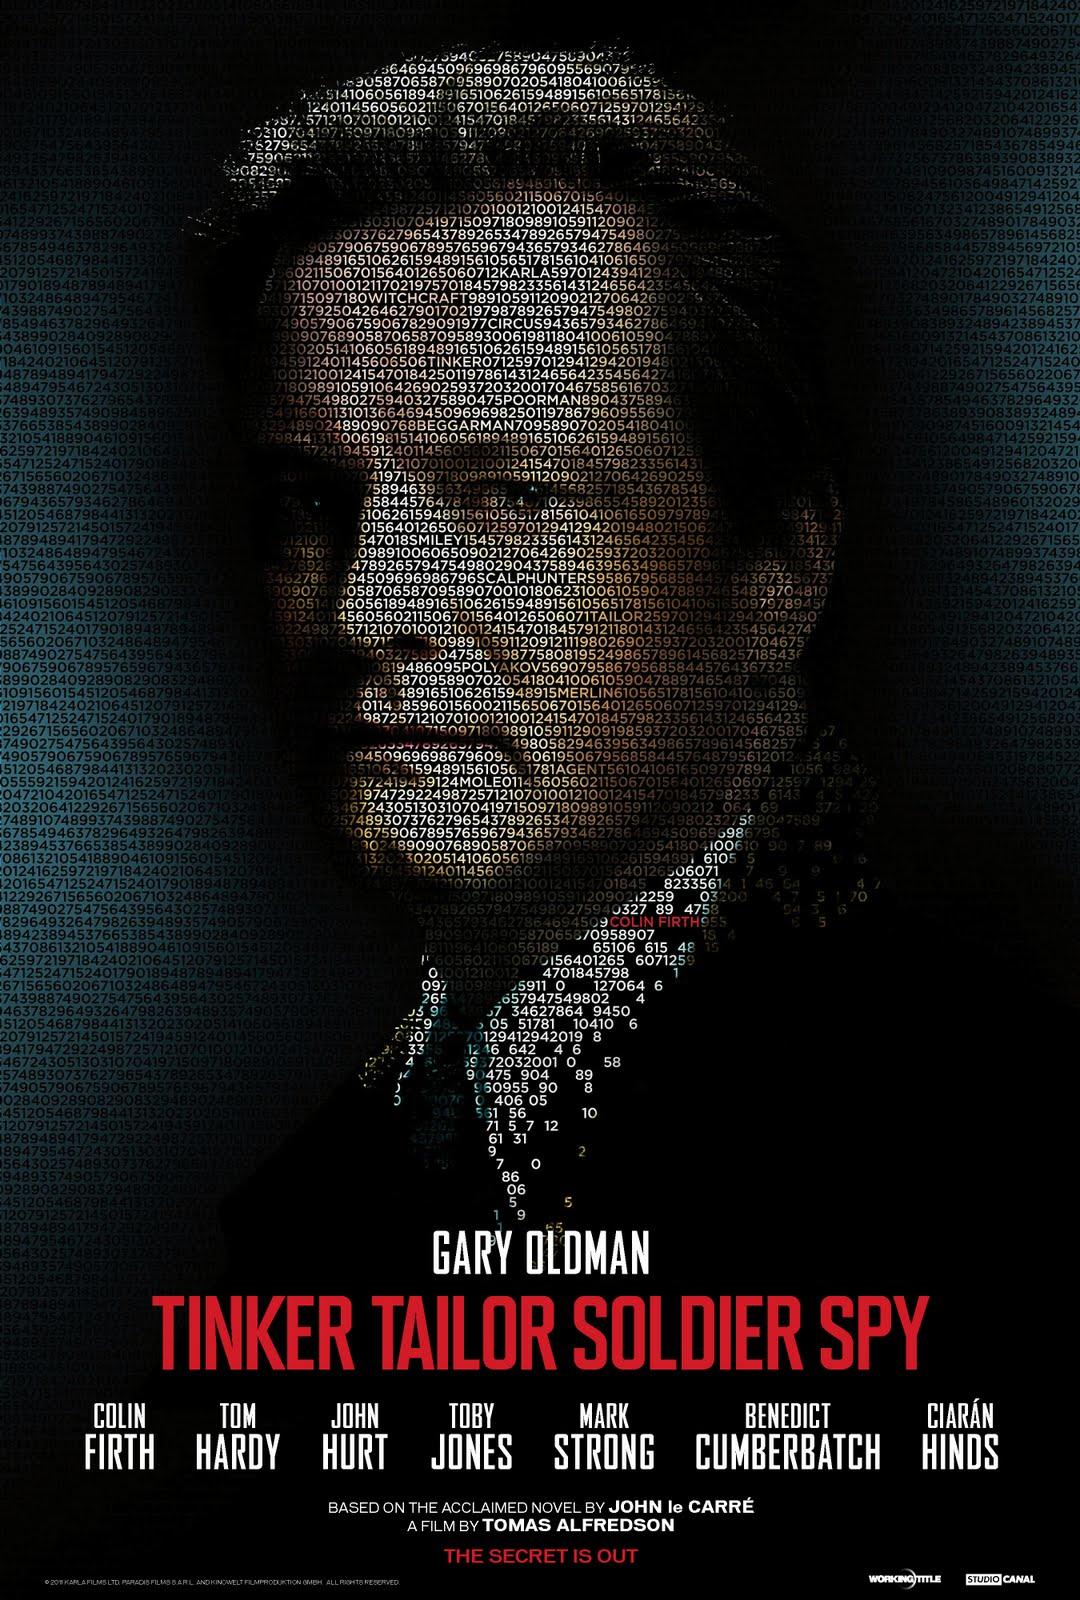 http://4.bp.blogspot.com/-2-8GYU9yxdg/Tk0wUKOEgRI/AAAAAAAAAwI/3zfl5_seLdI/s1600/tinker-tailor-soldier-spy-movie-poster-colin-firth.jpg